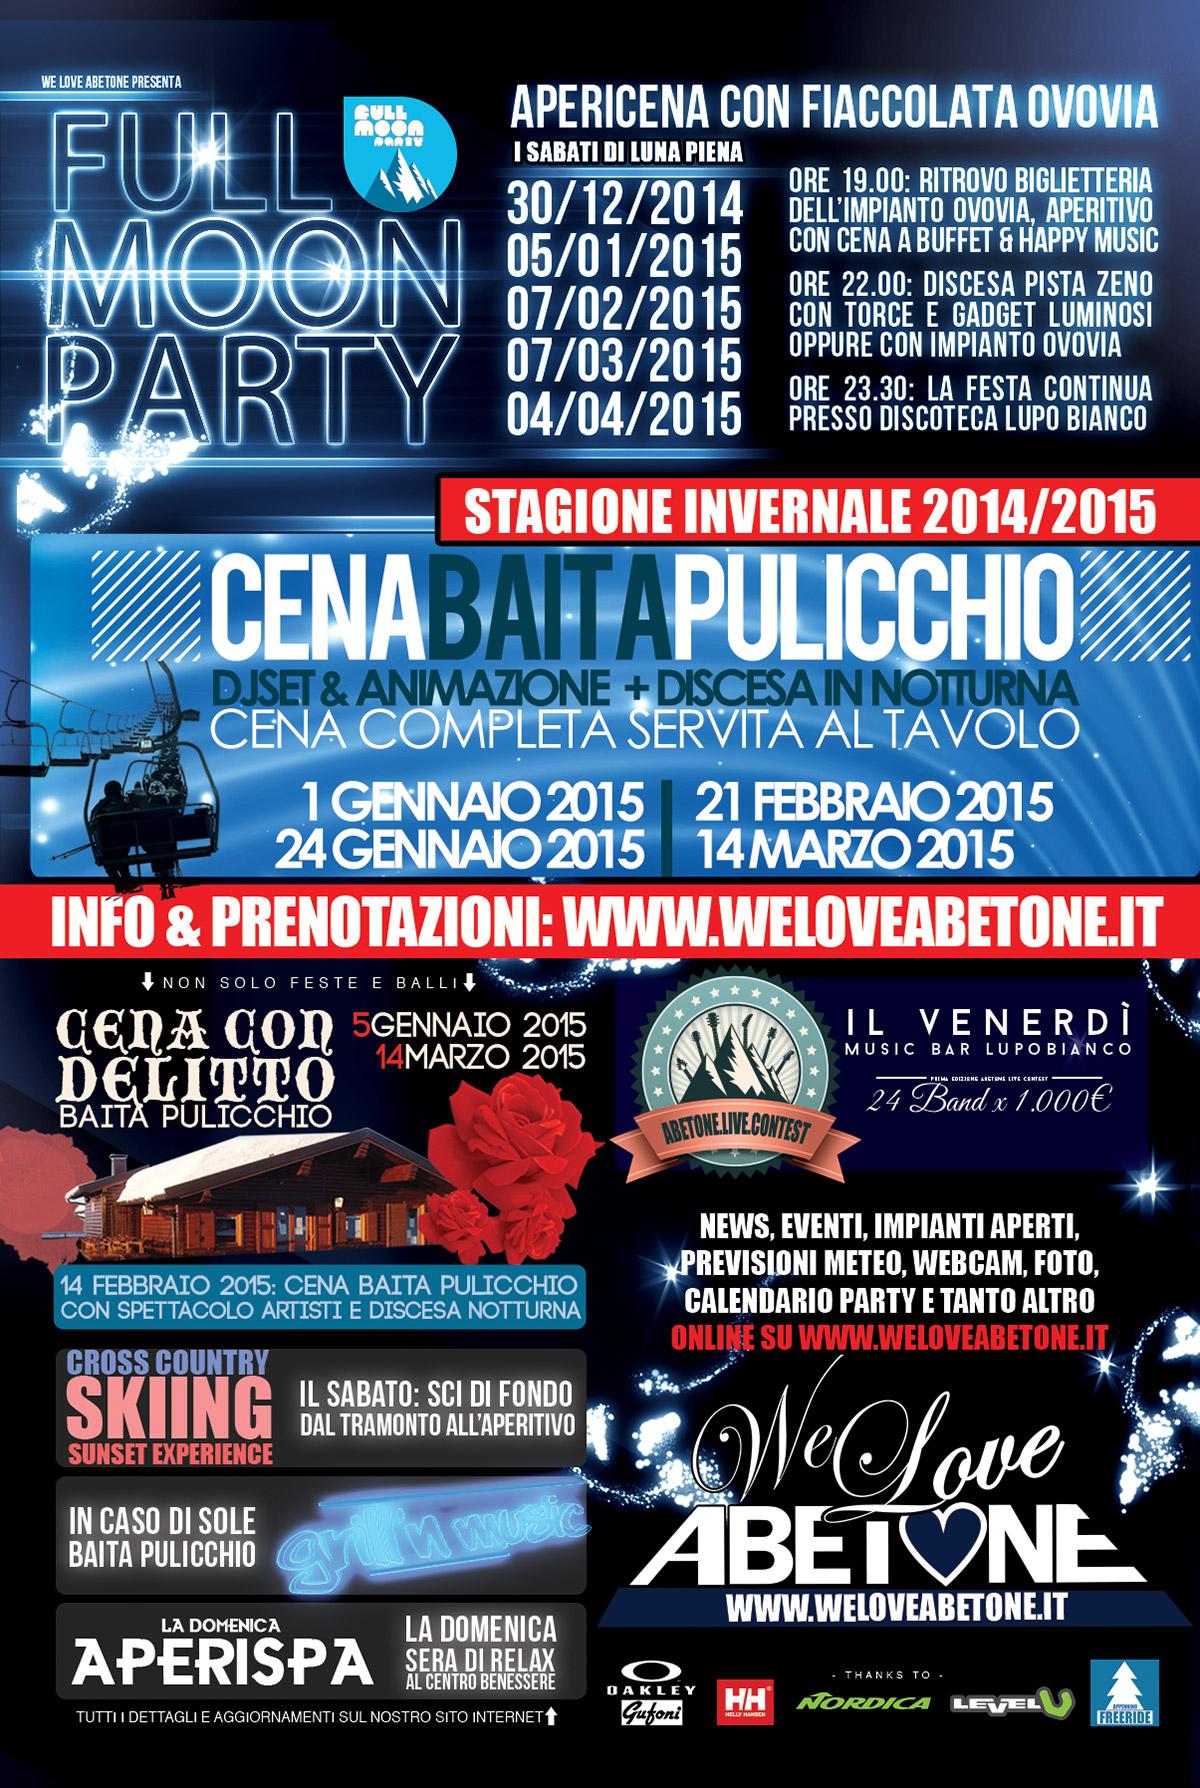 eventi abetone stagione 2015